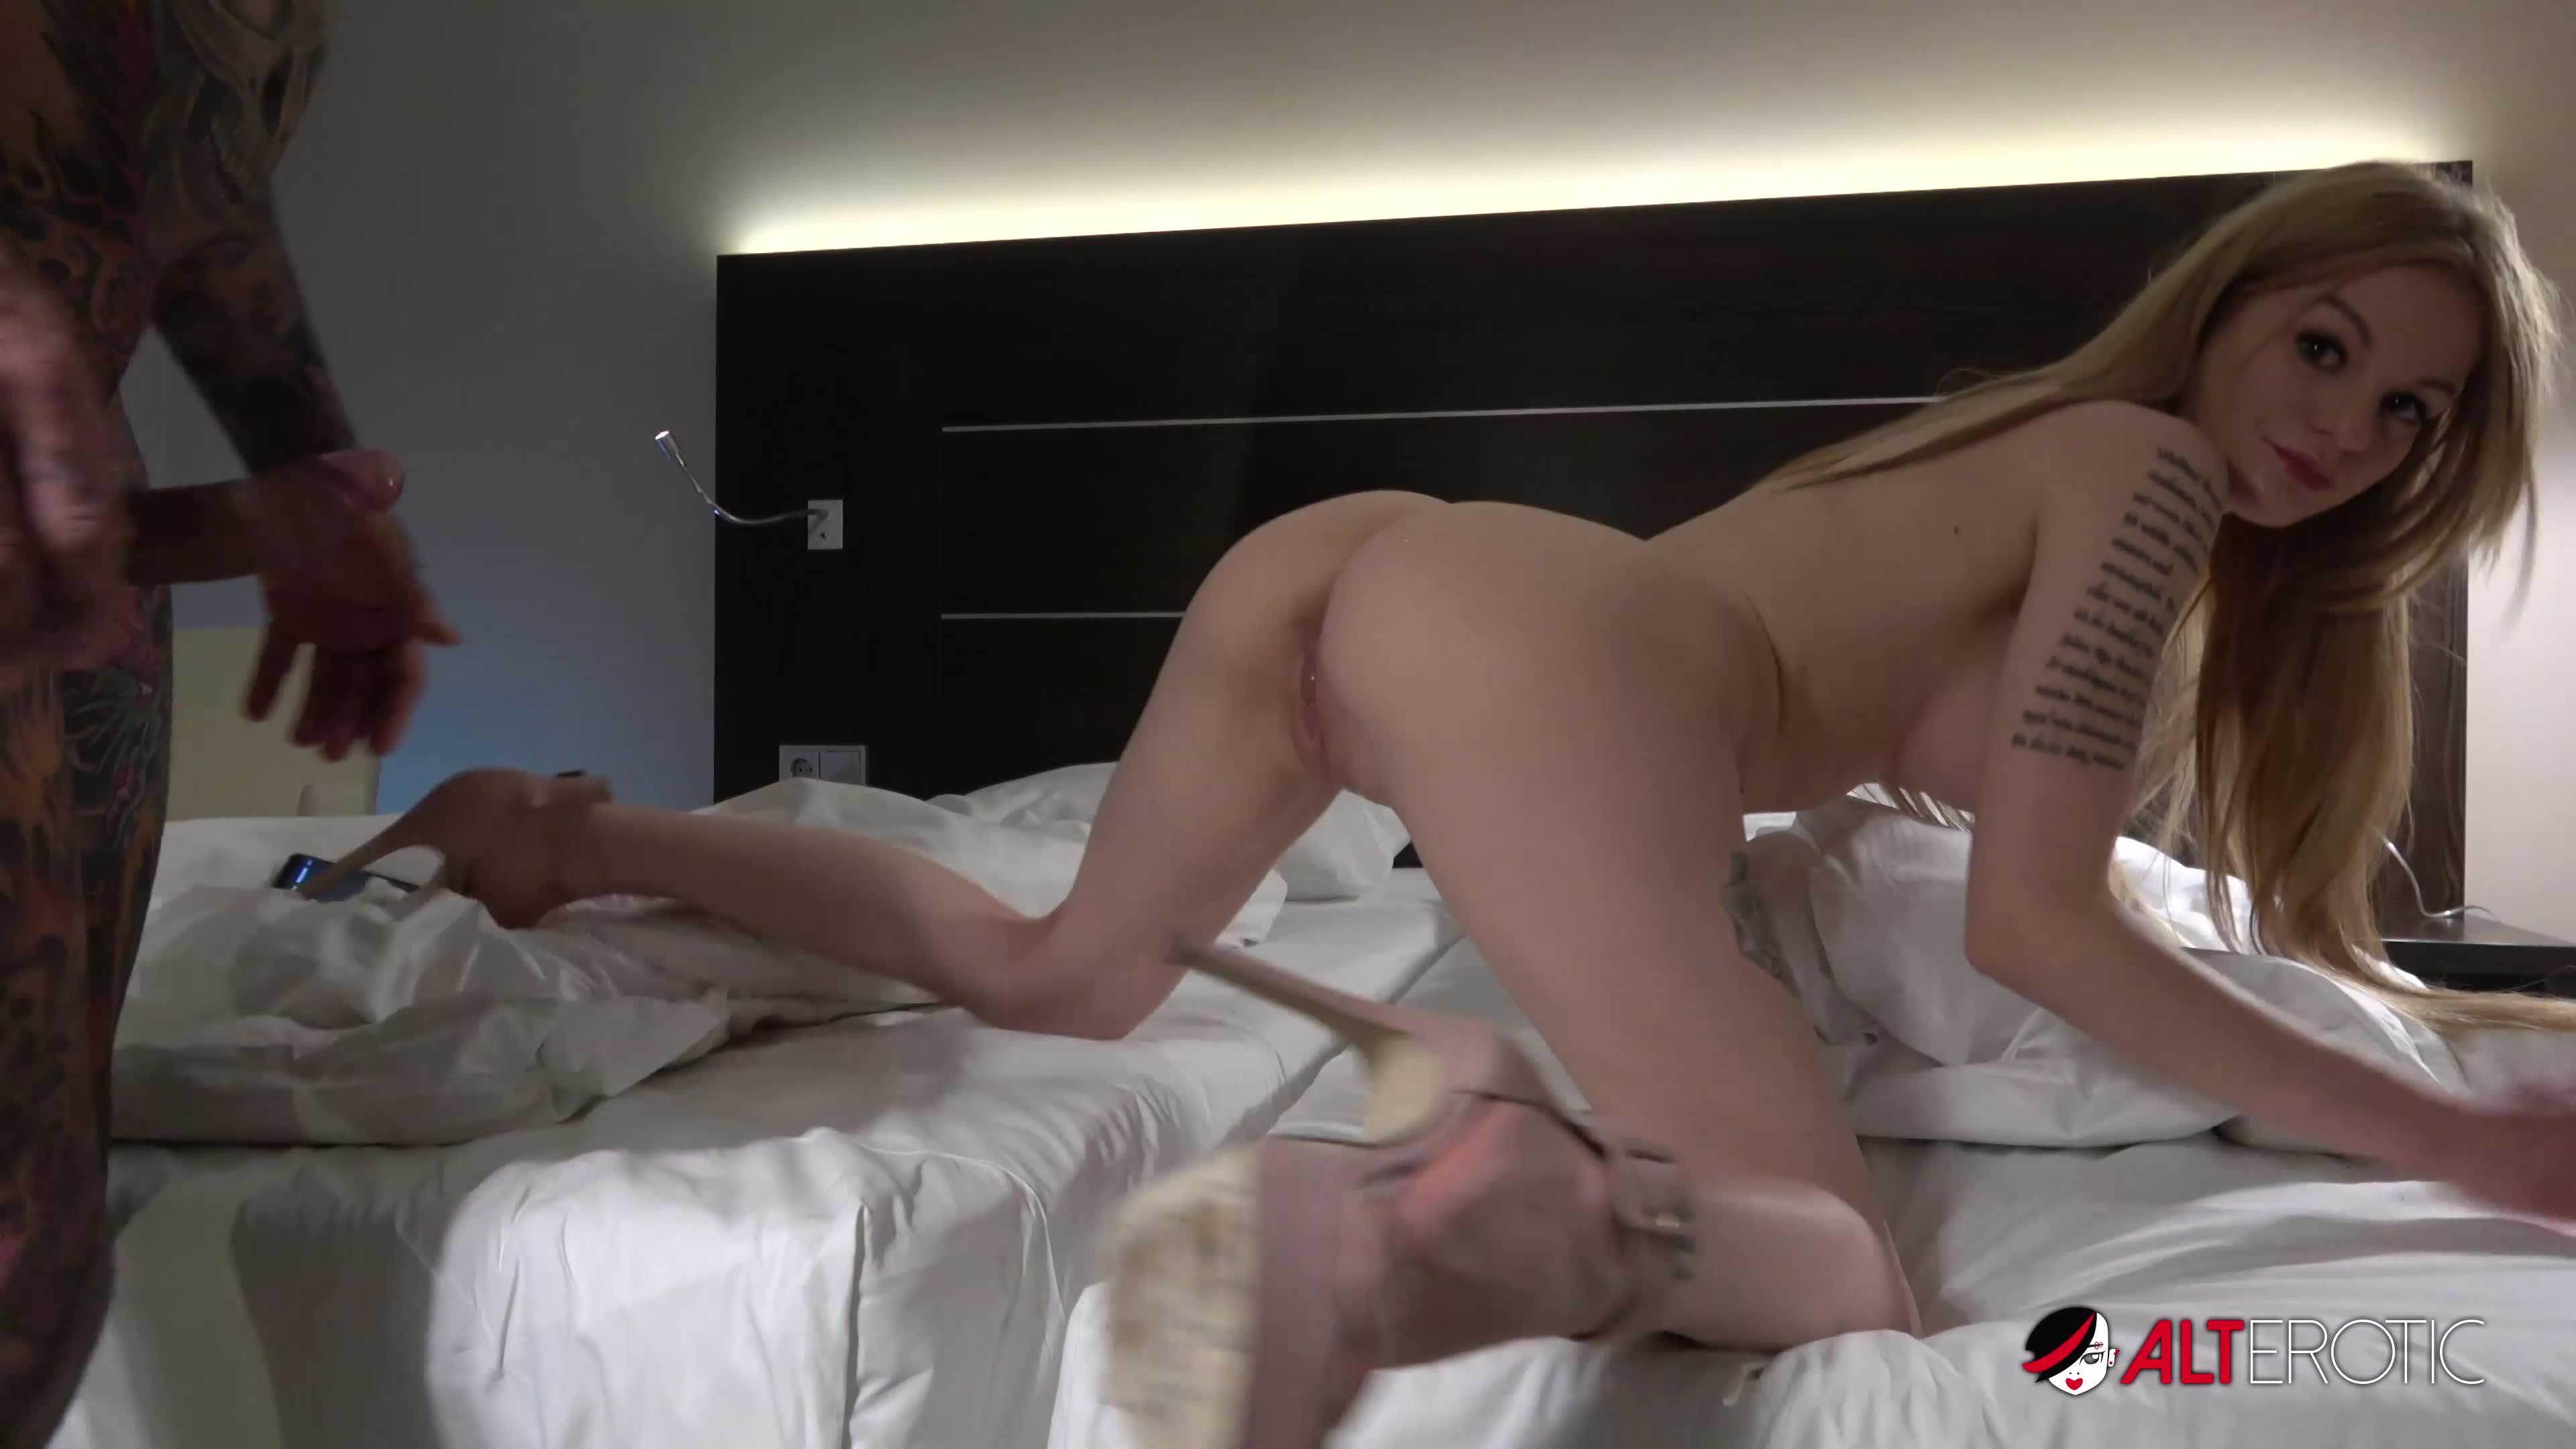 Bad girls club 3 nude pics